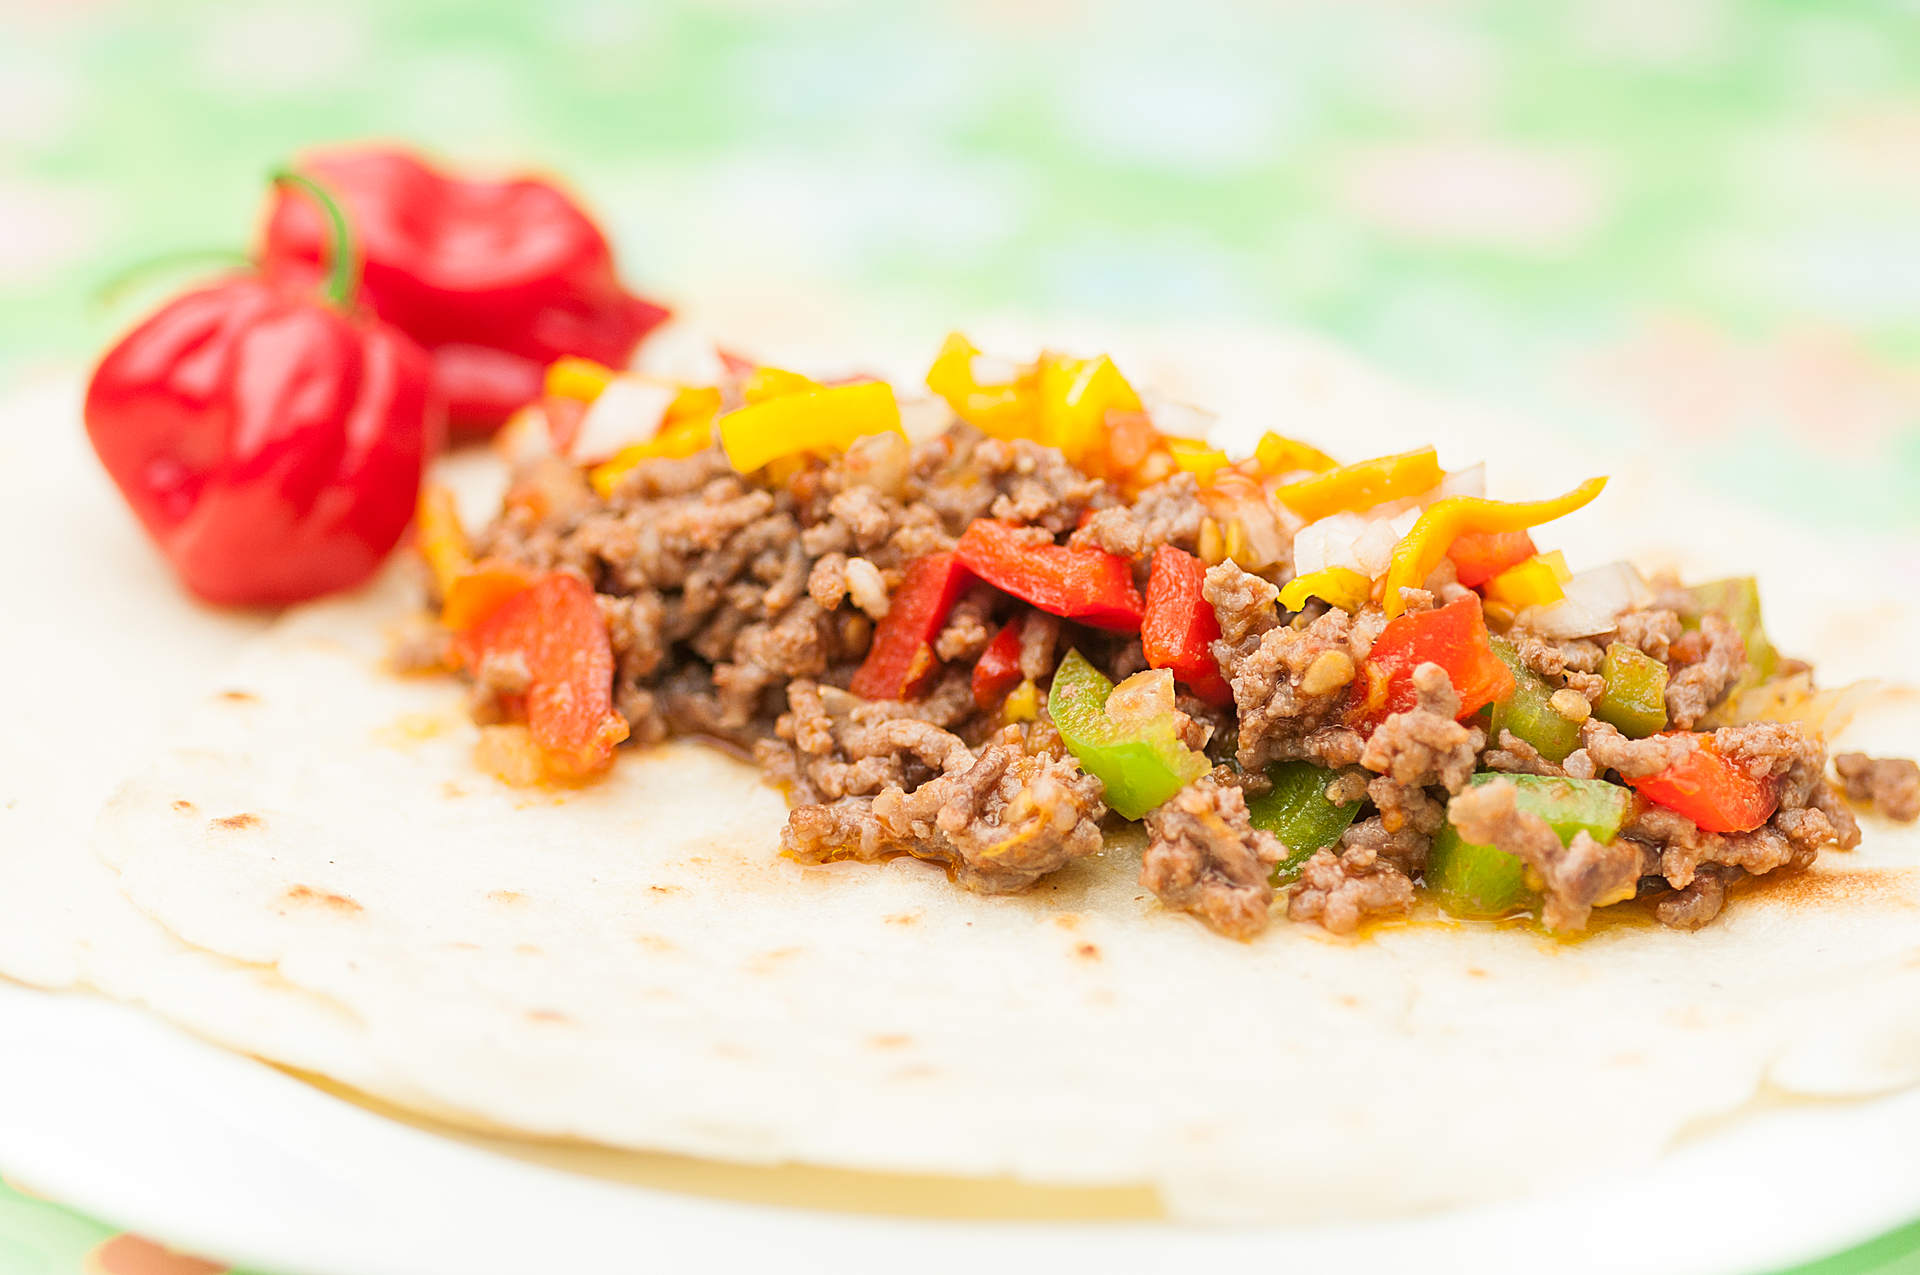 Carnes recetas mexicanas de carnes 1 for Comidas economicas mexicanas